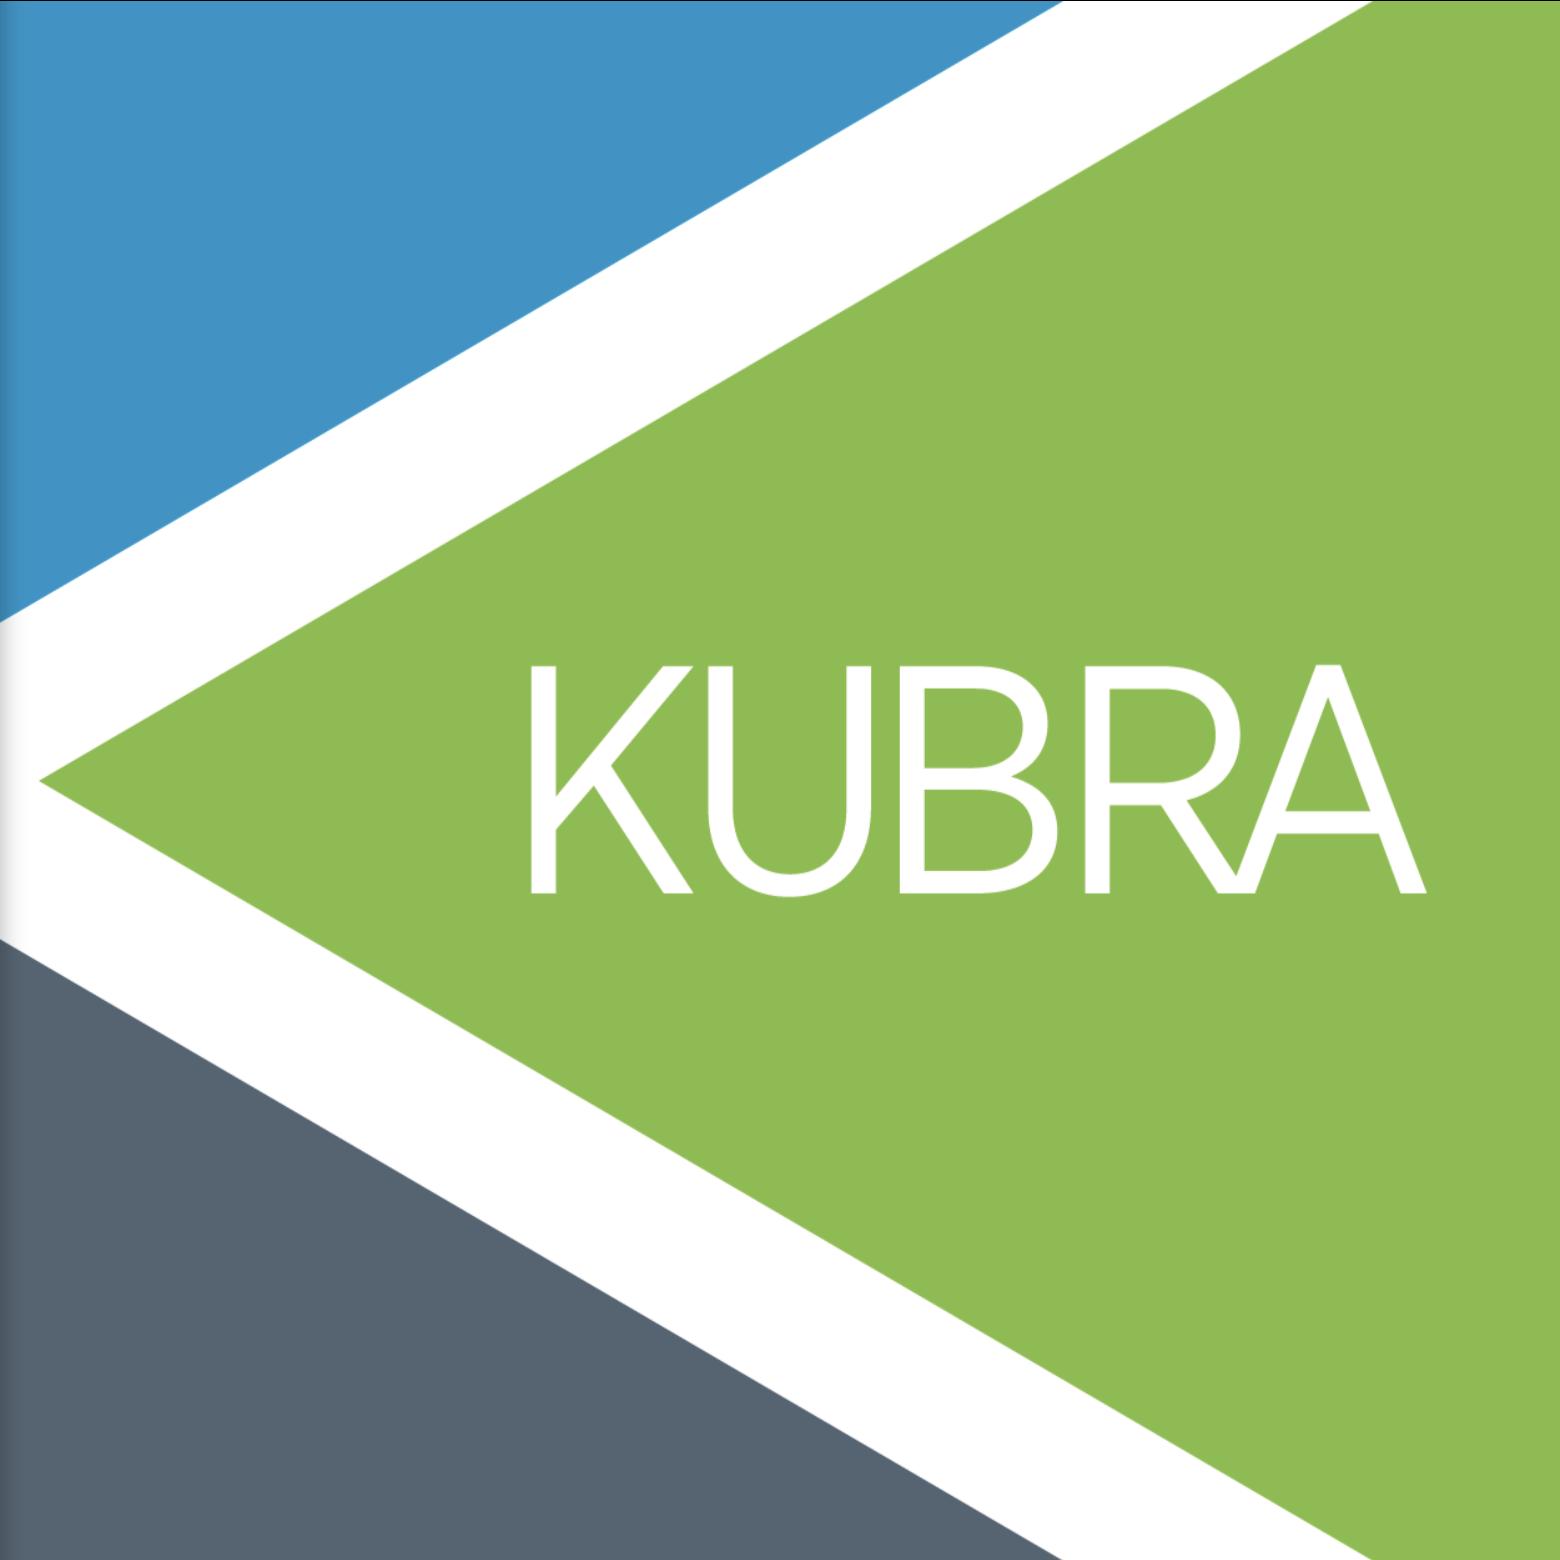 Kubra Communication Solutions